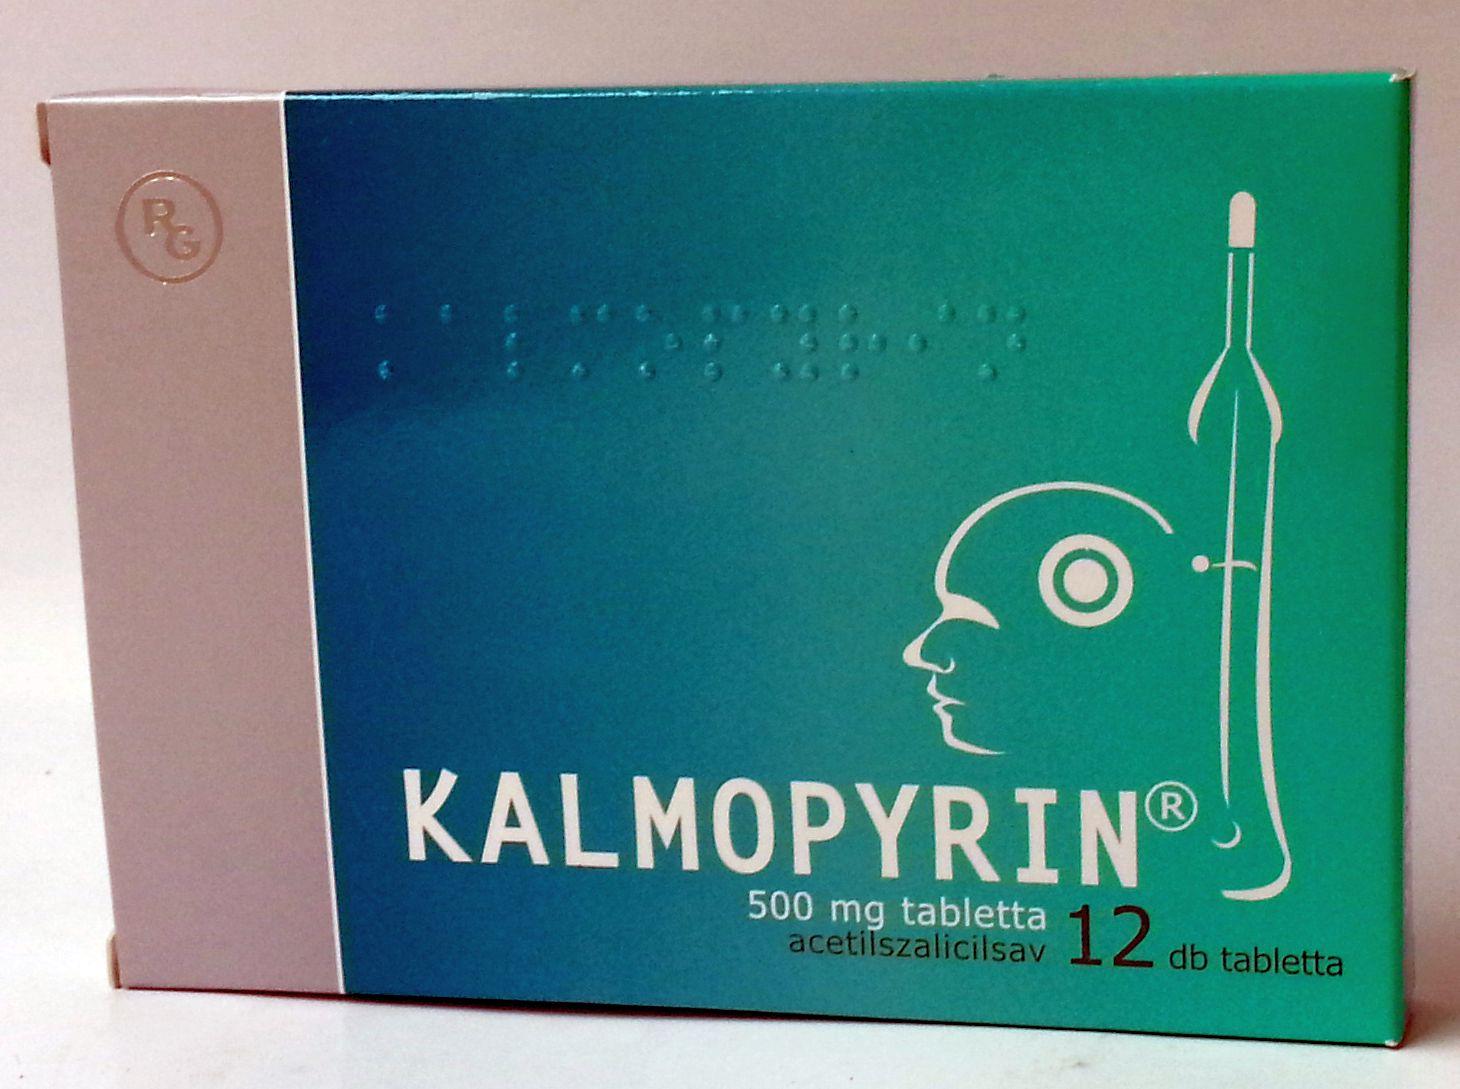 KALMOPYRIN.jpg